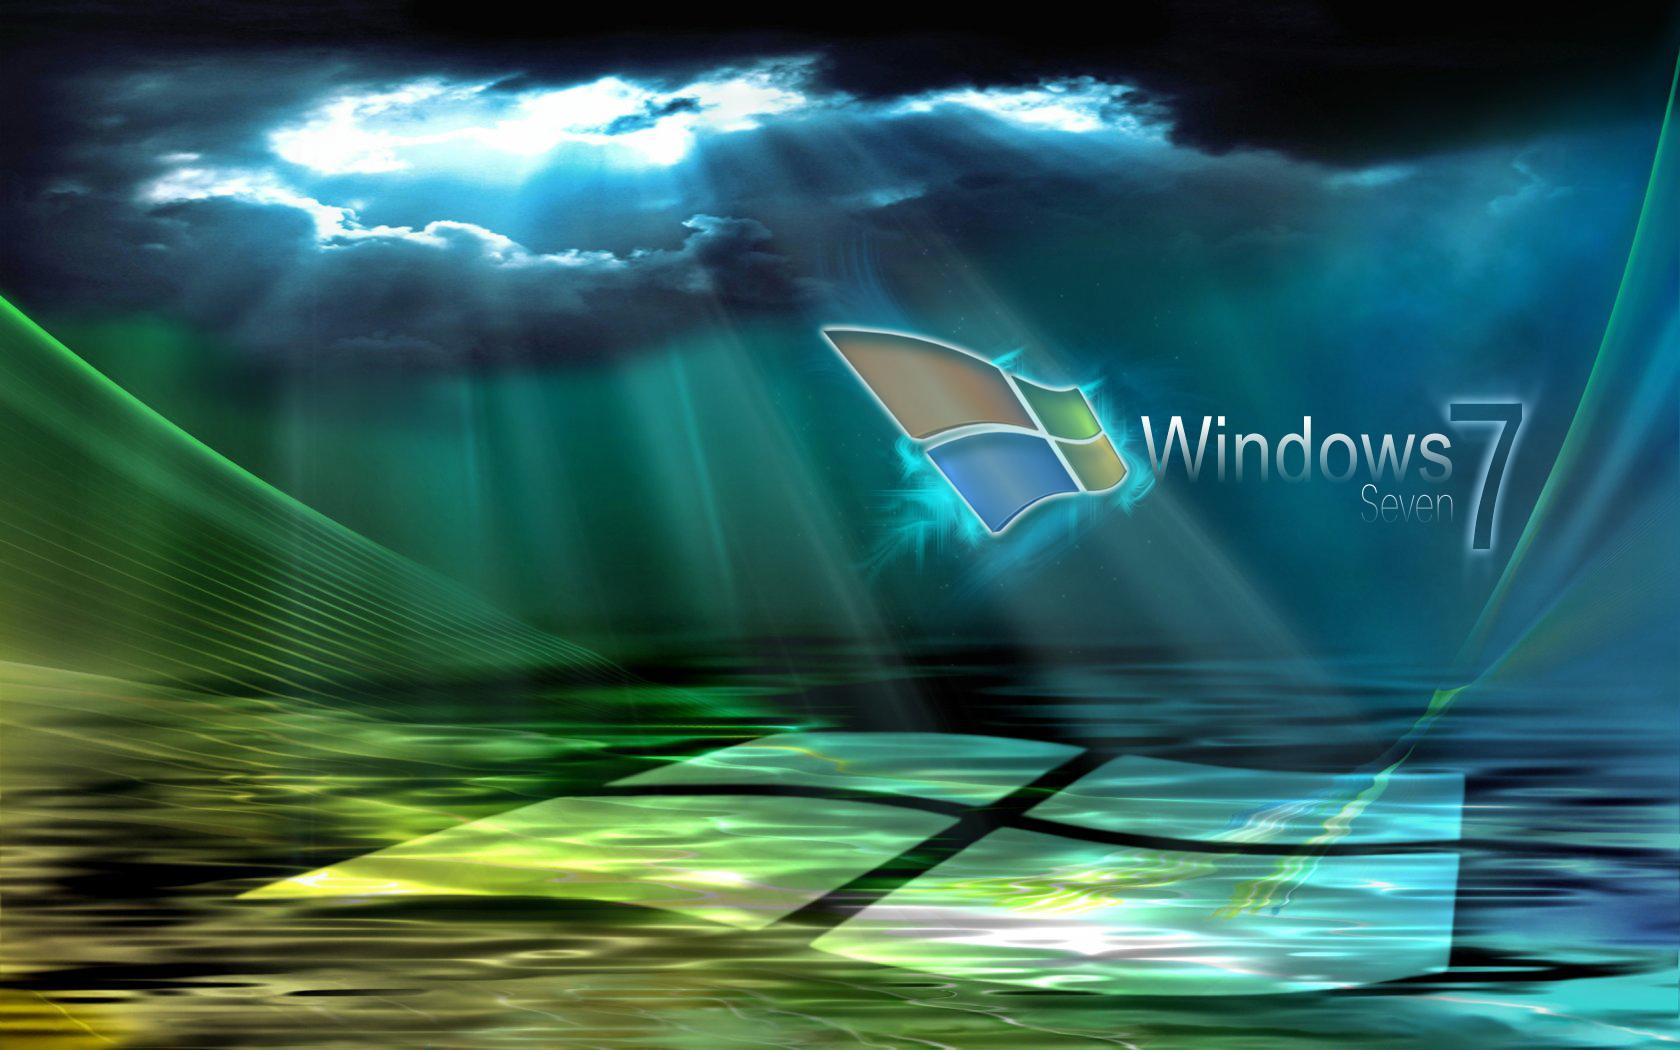 Windows 7 Wallpapers Hd Windows 7 Wallpapers Hd 2 Chainimage 1680x1050